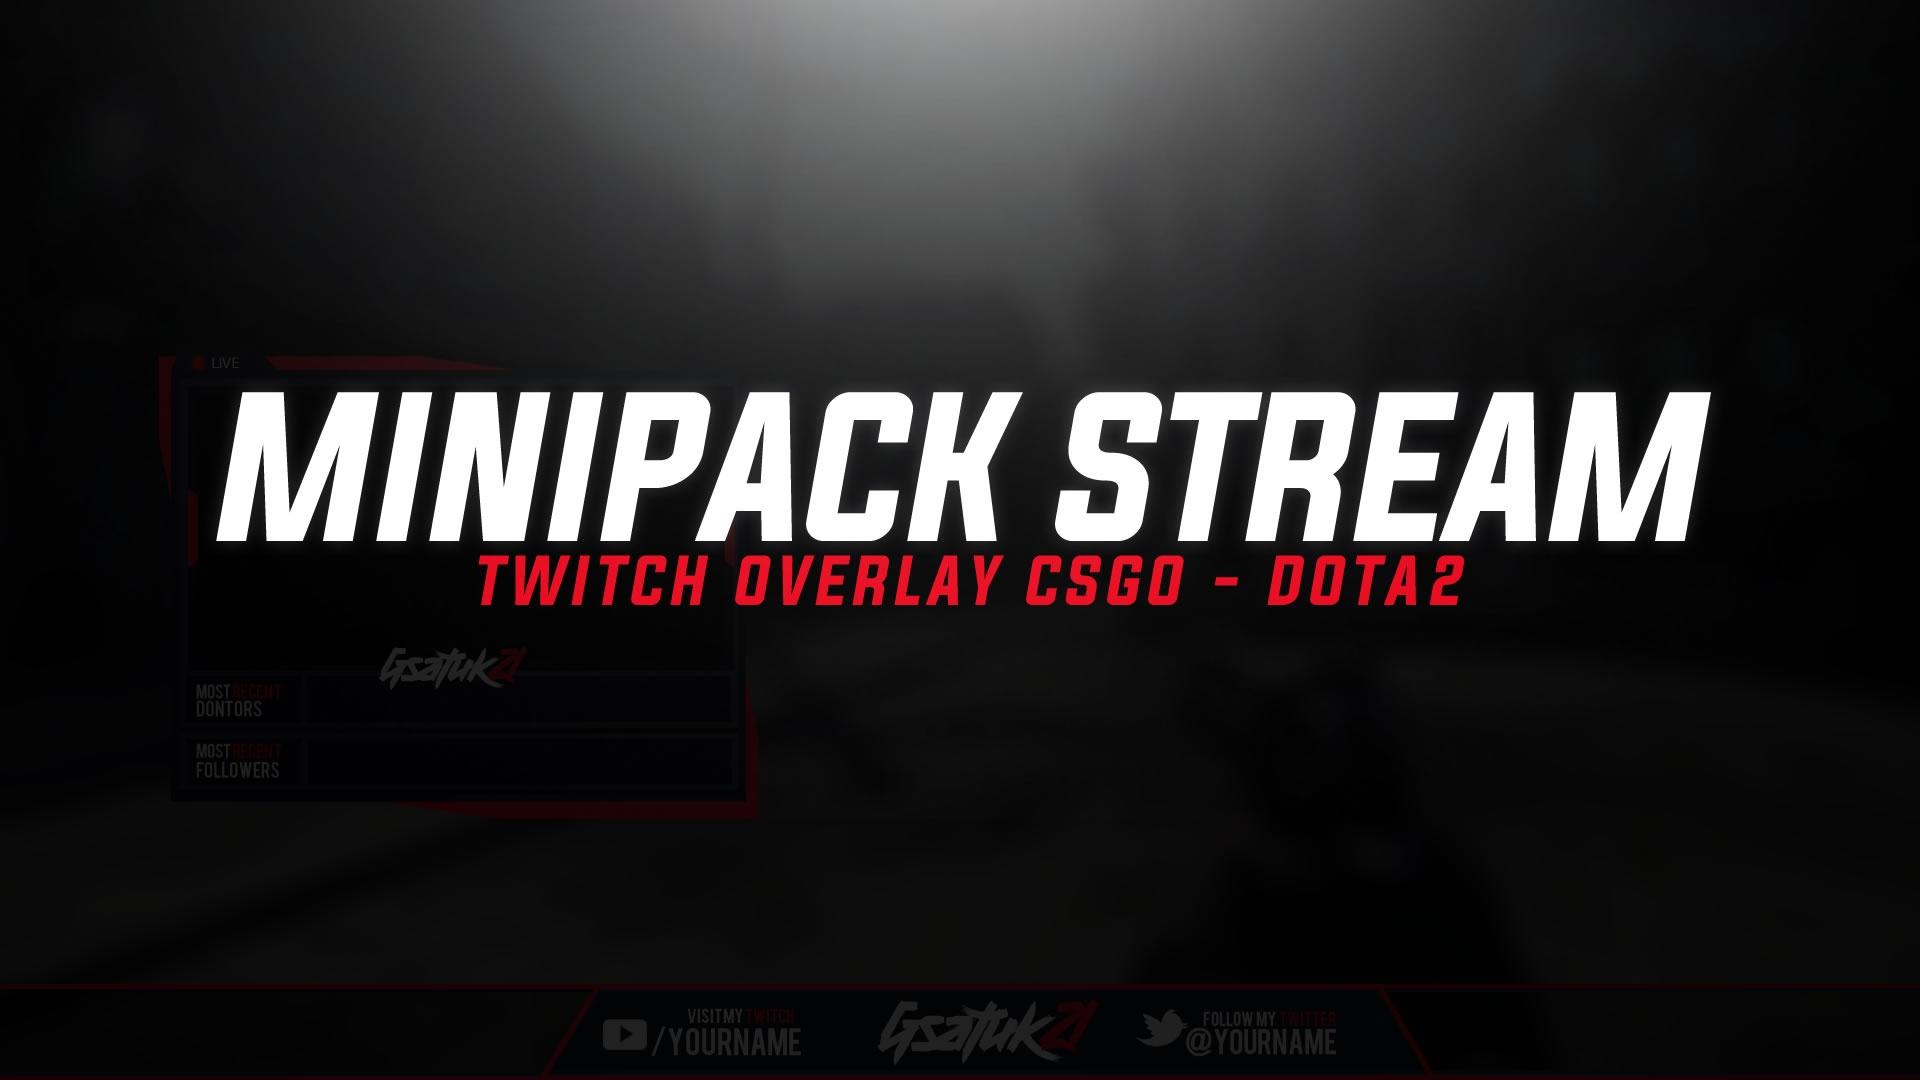 minipack stream twitch overlay csgo and dota 2 nit